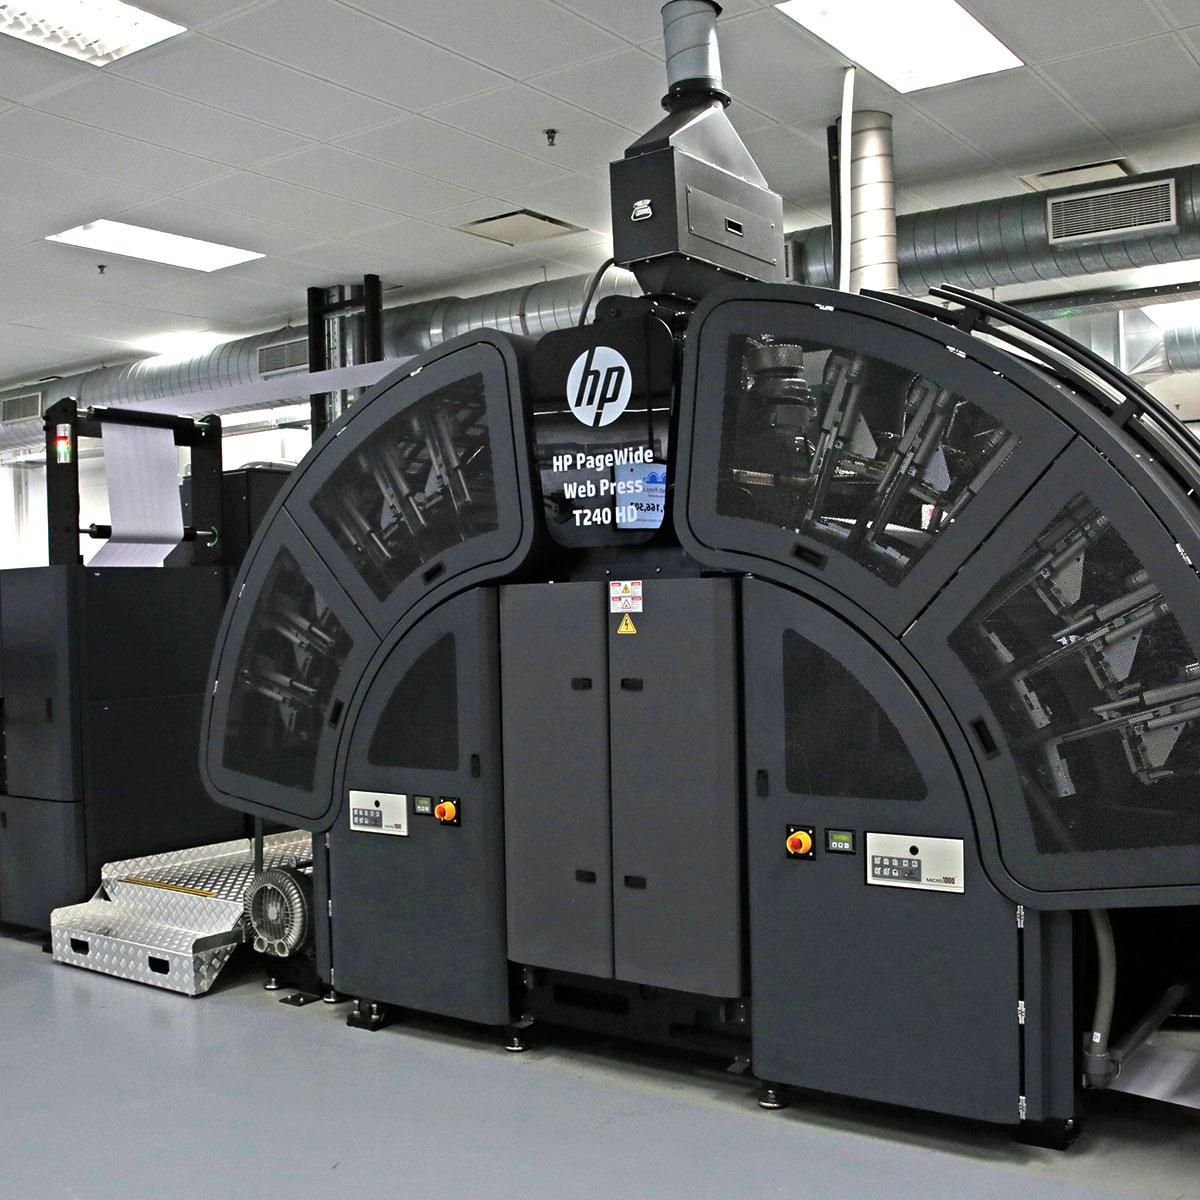 HP PageWide Web Press T240 HD Machine